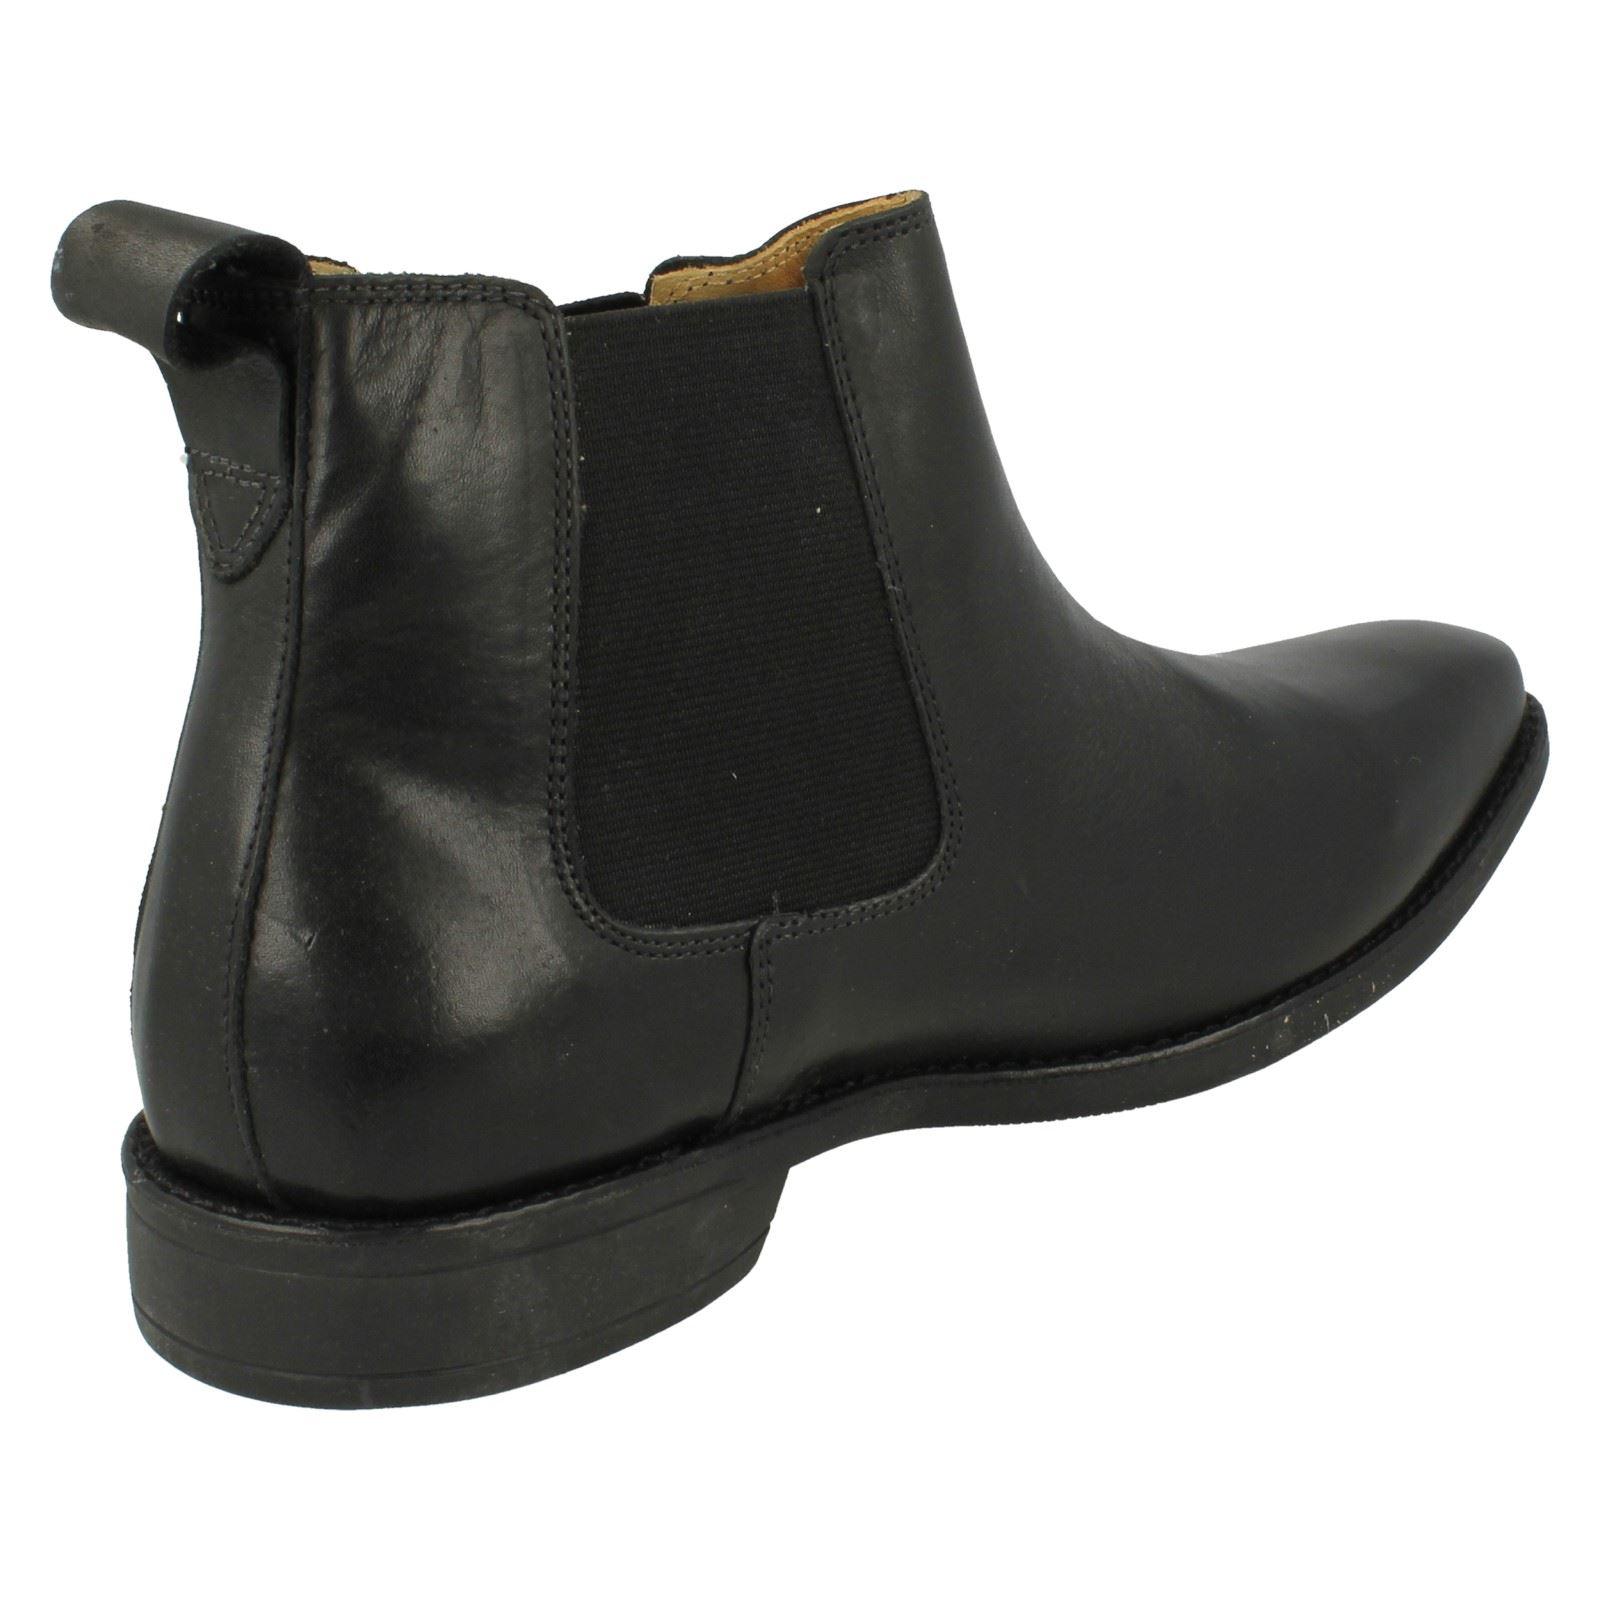 Mens-Anatomic-Chelsea-Boots-039-929211LB-039 thumbnail 8